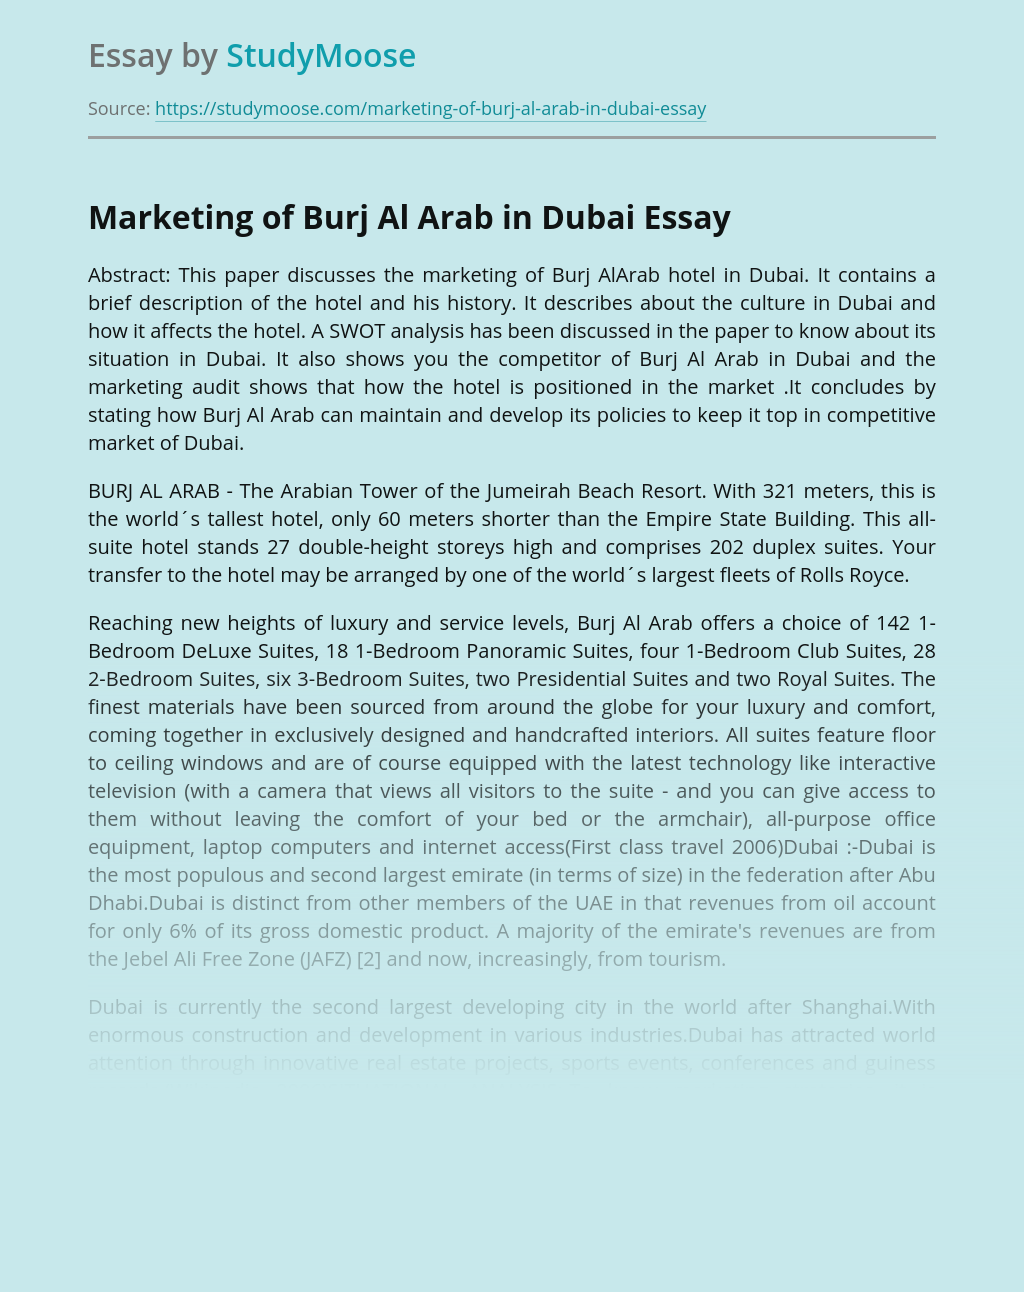 Marketing of Burj Al Arab in Dubai